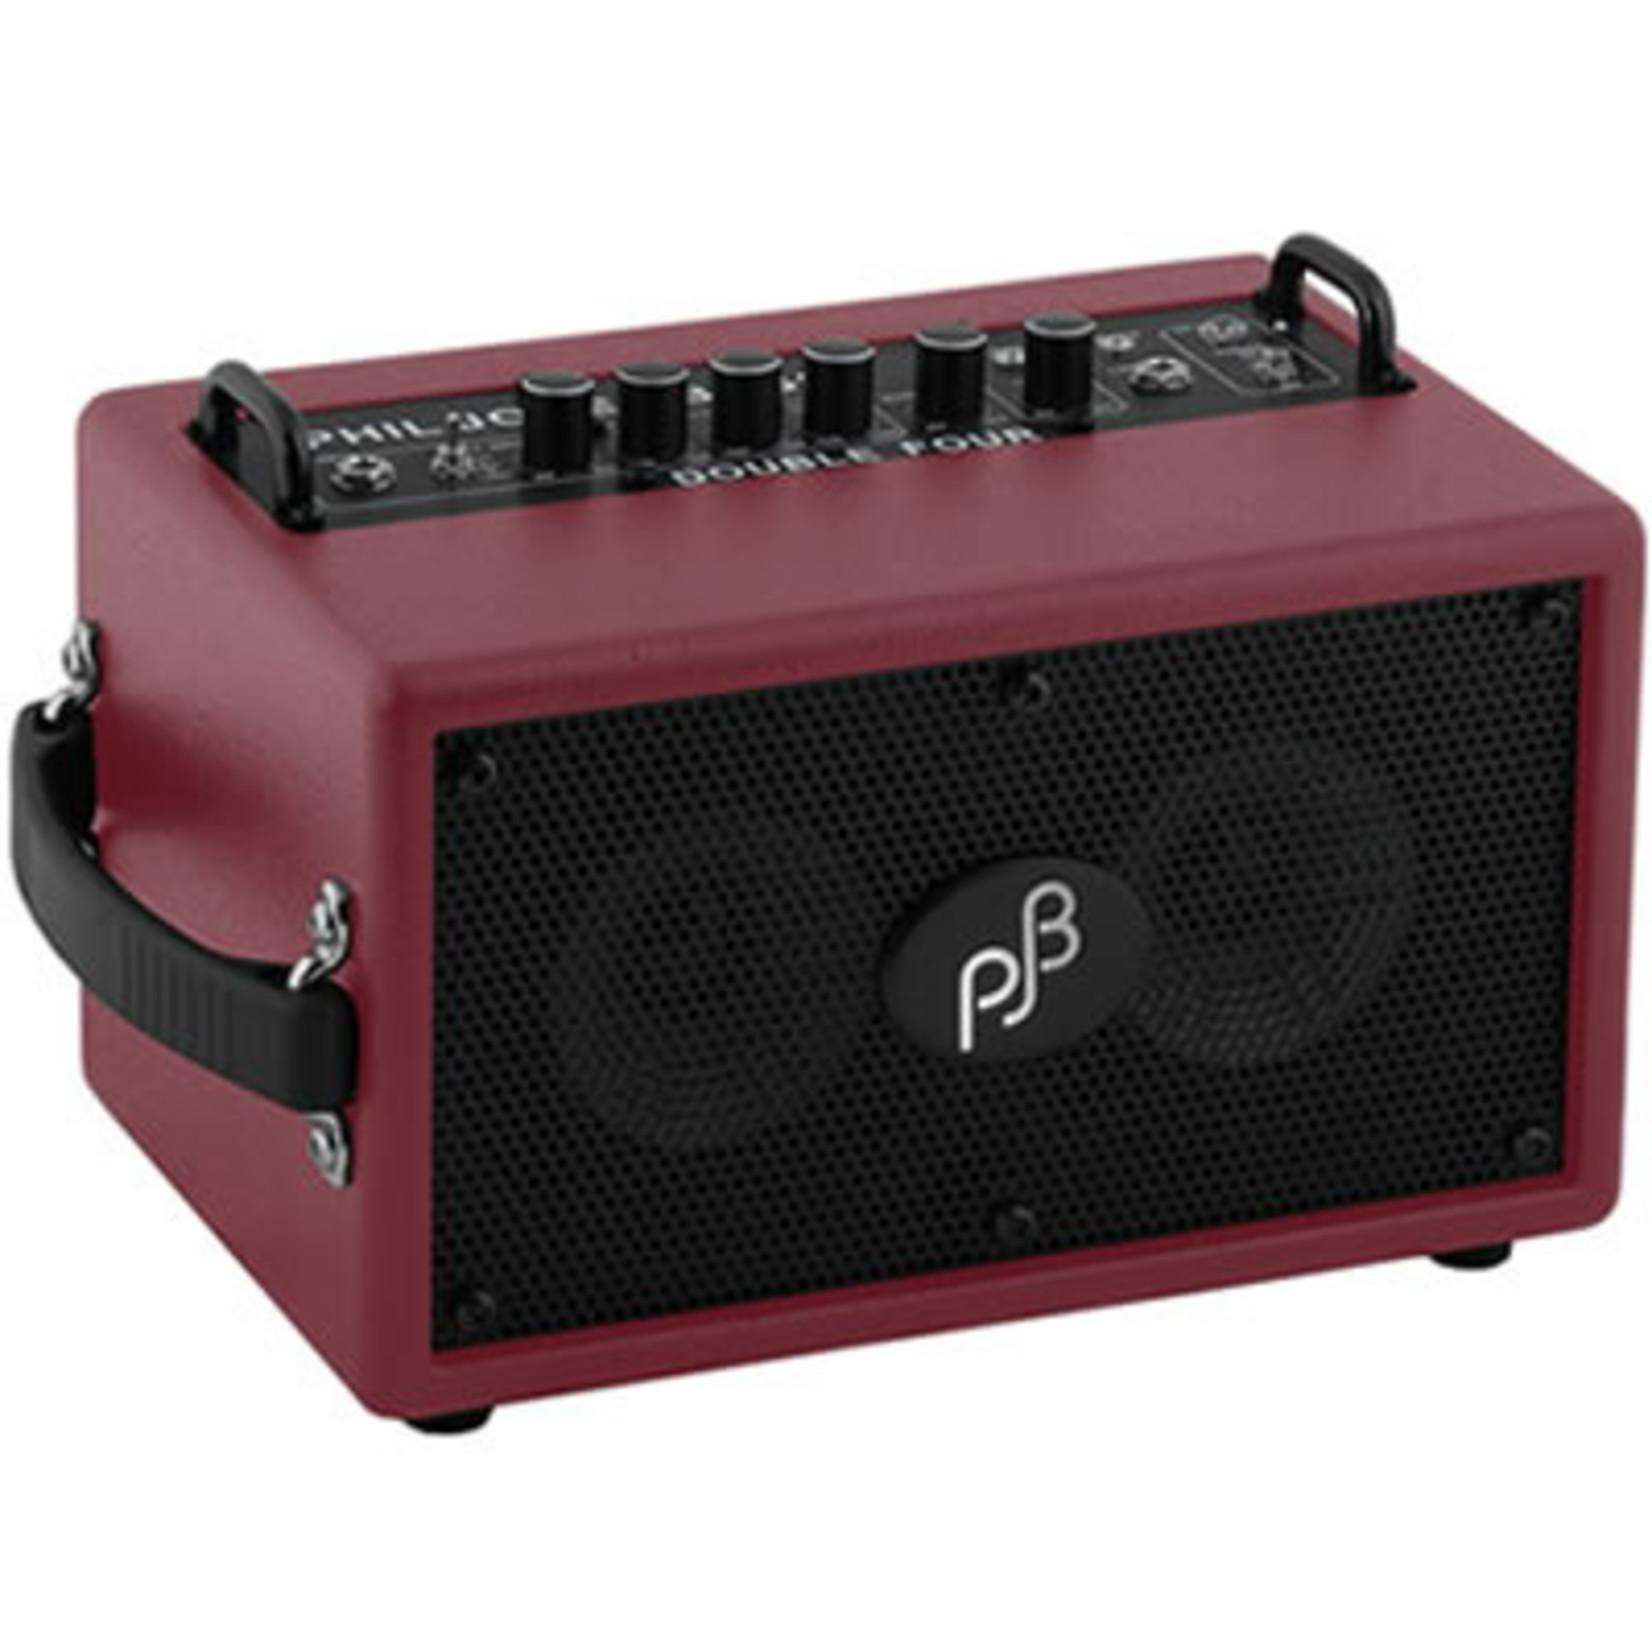 "Phil Jones Phil Jones BG75-R Bass Double Four 70-Watt 2x4"" Micro Bass Combo Amp, Red"